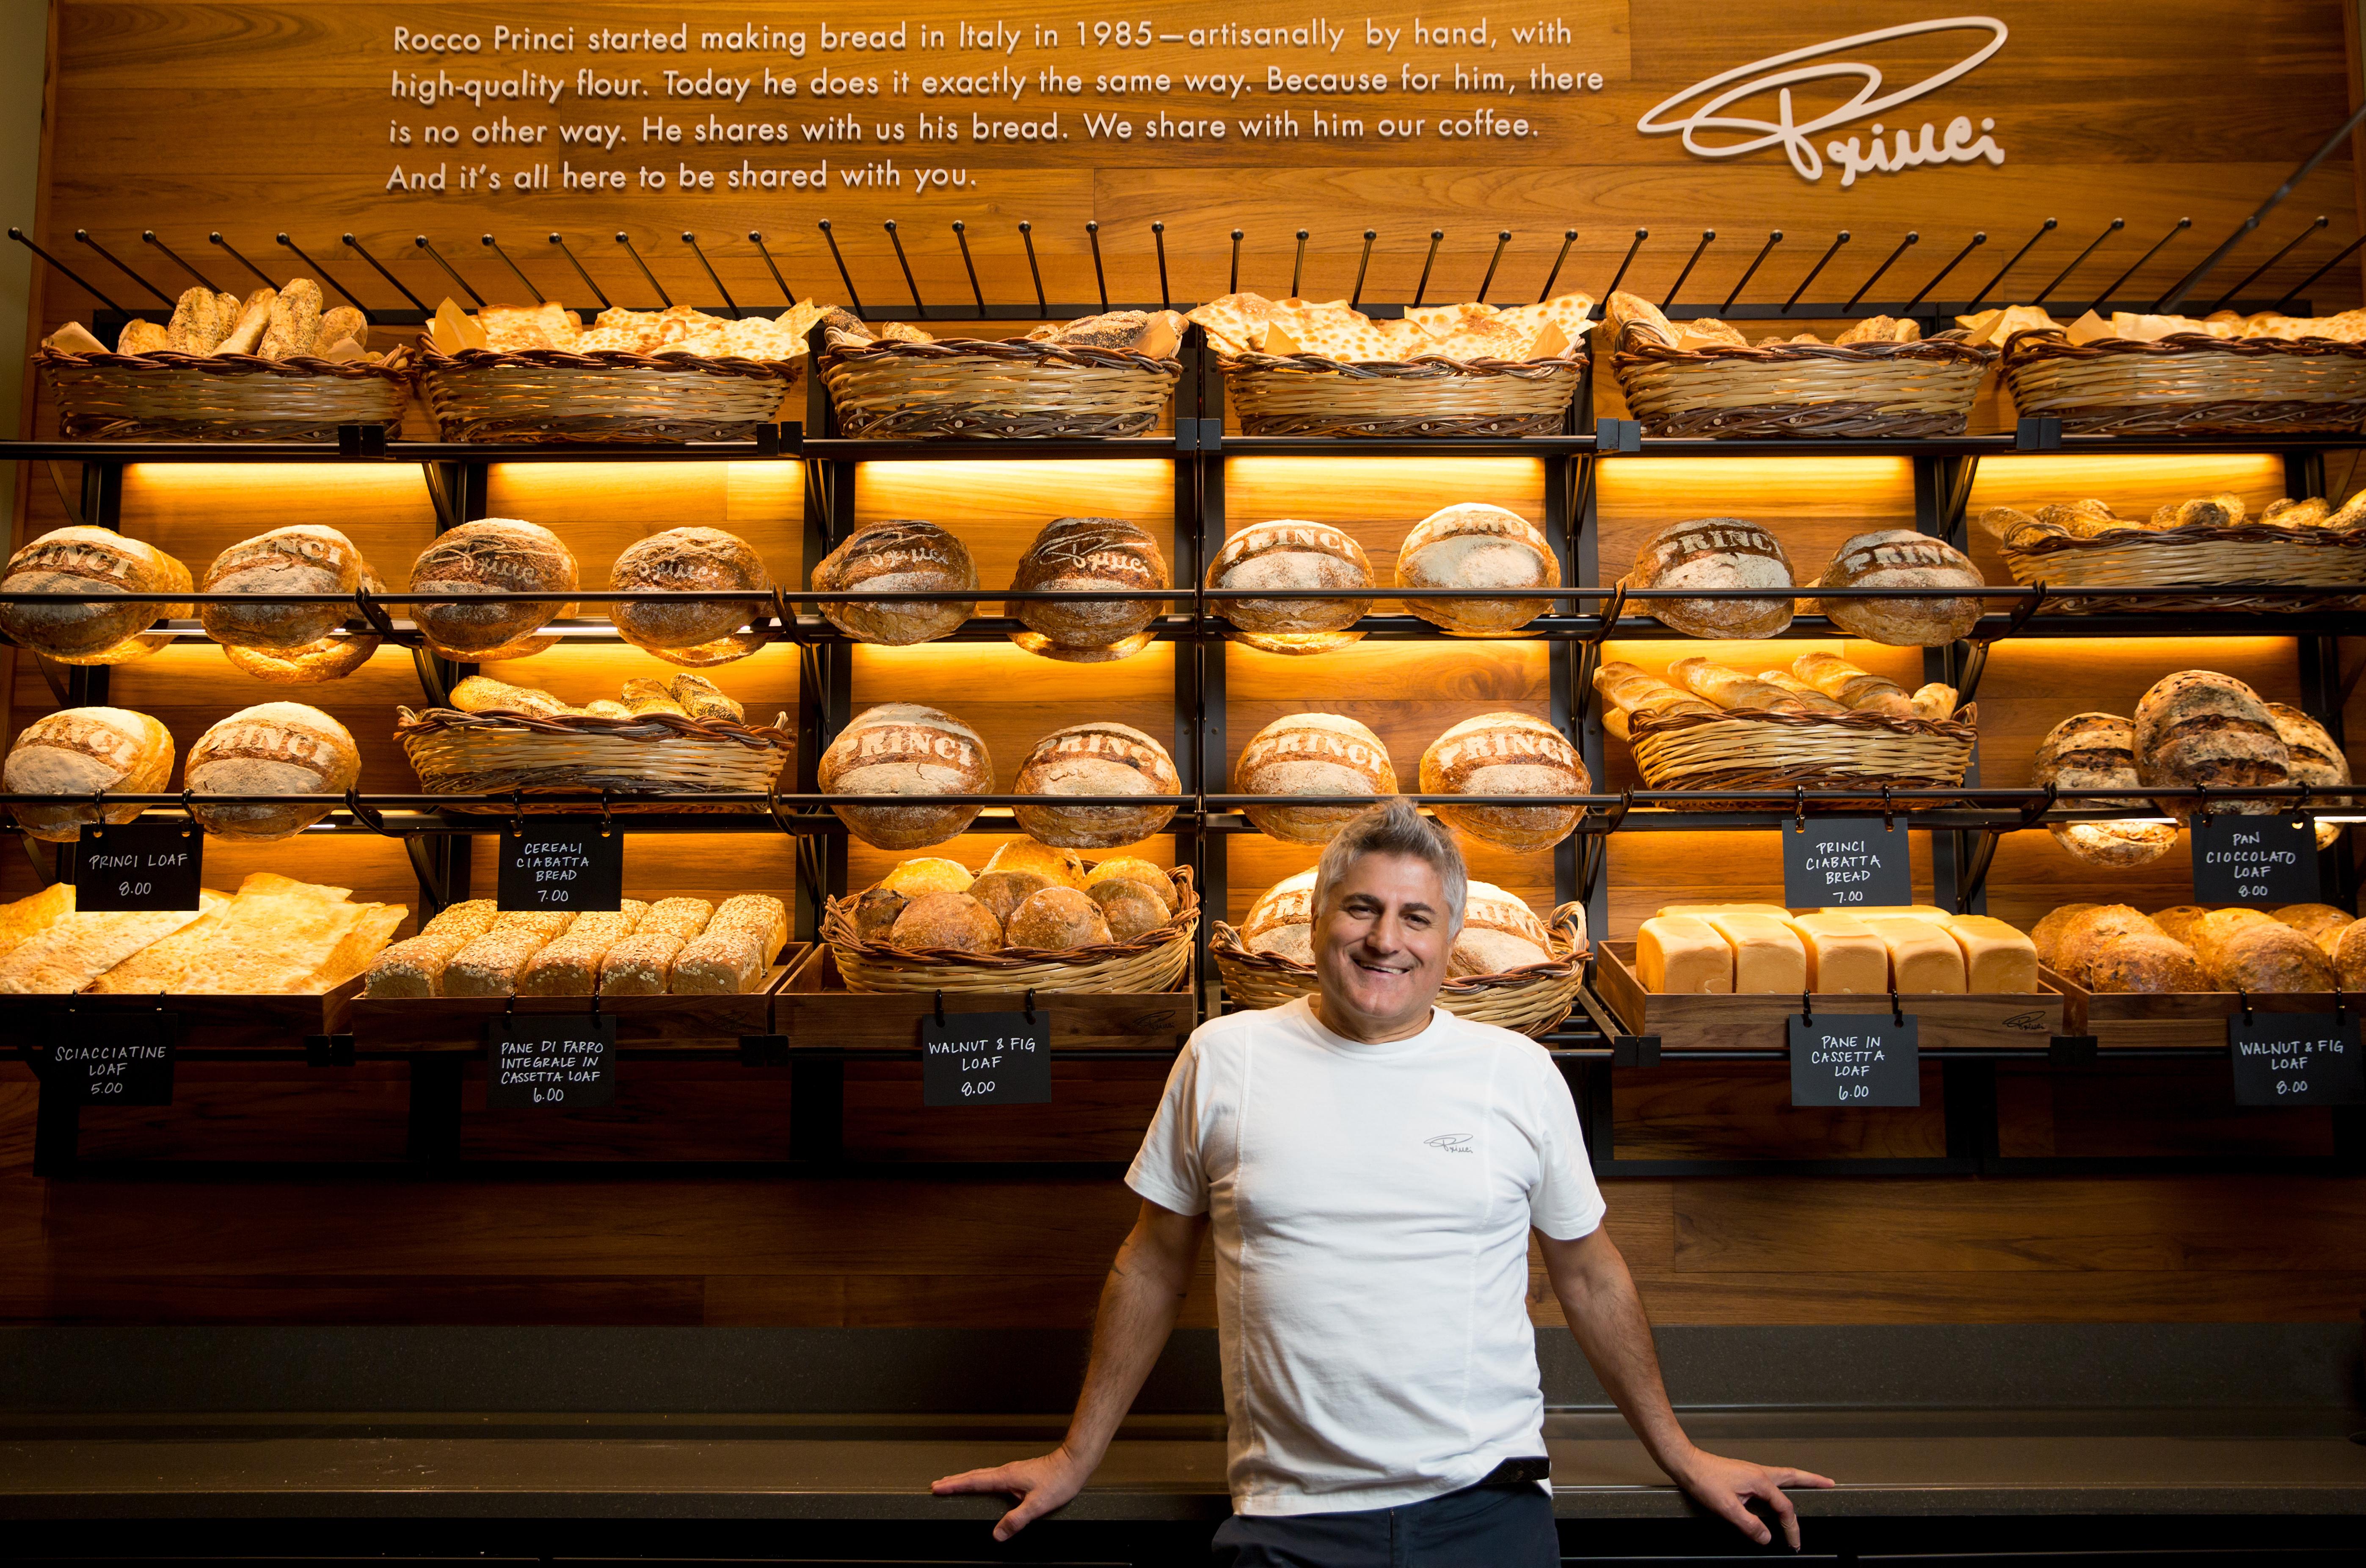 Starbucks Brings Renowned Italian Princi Bakery To The US Inside